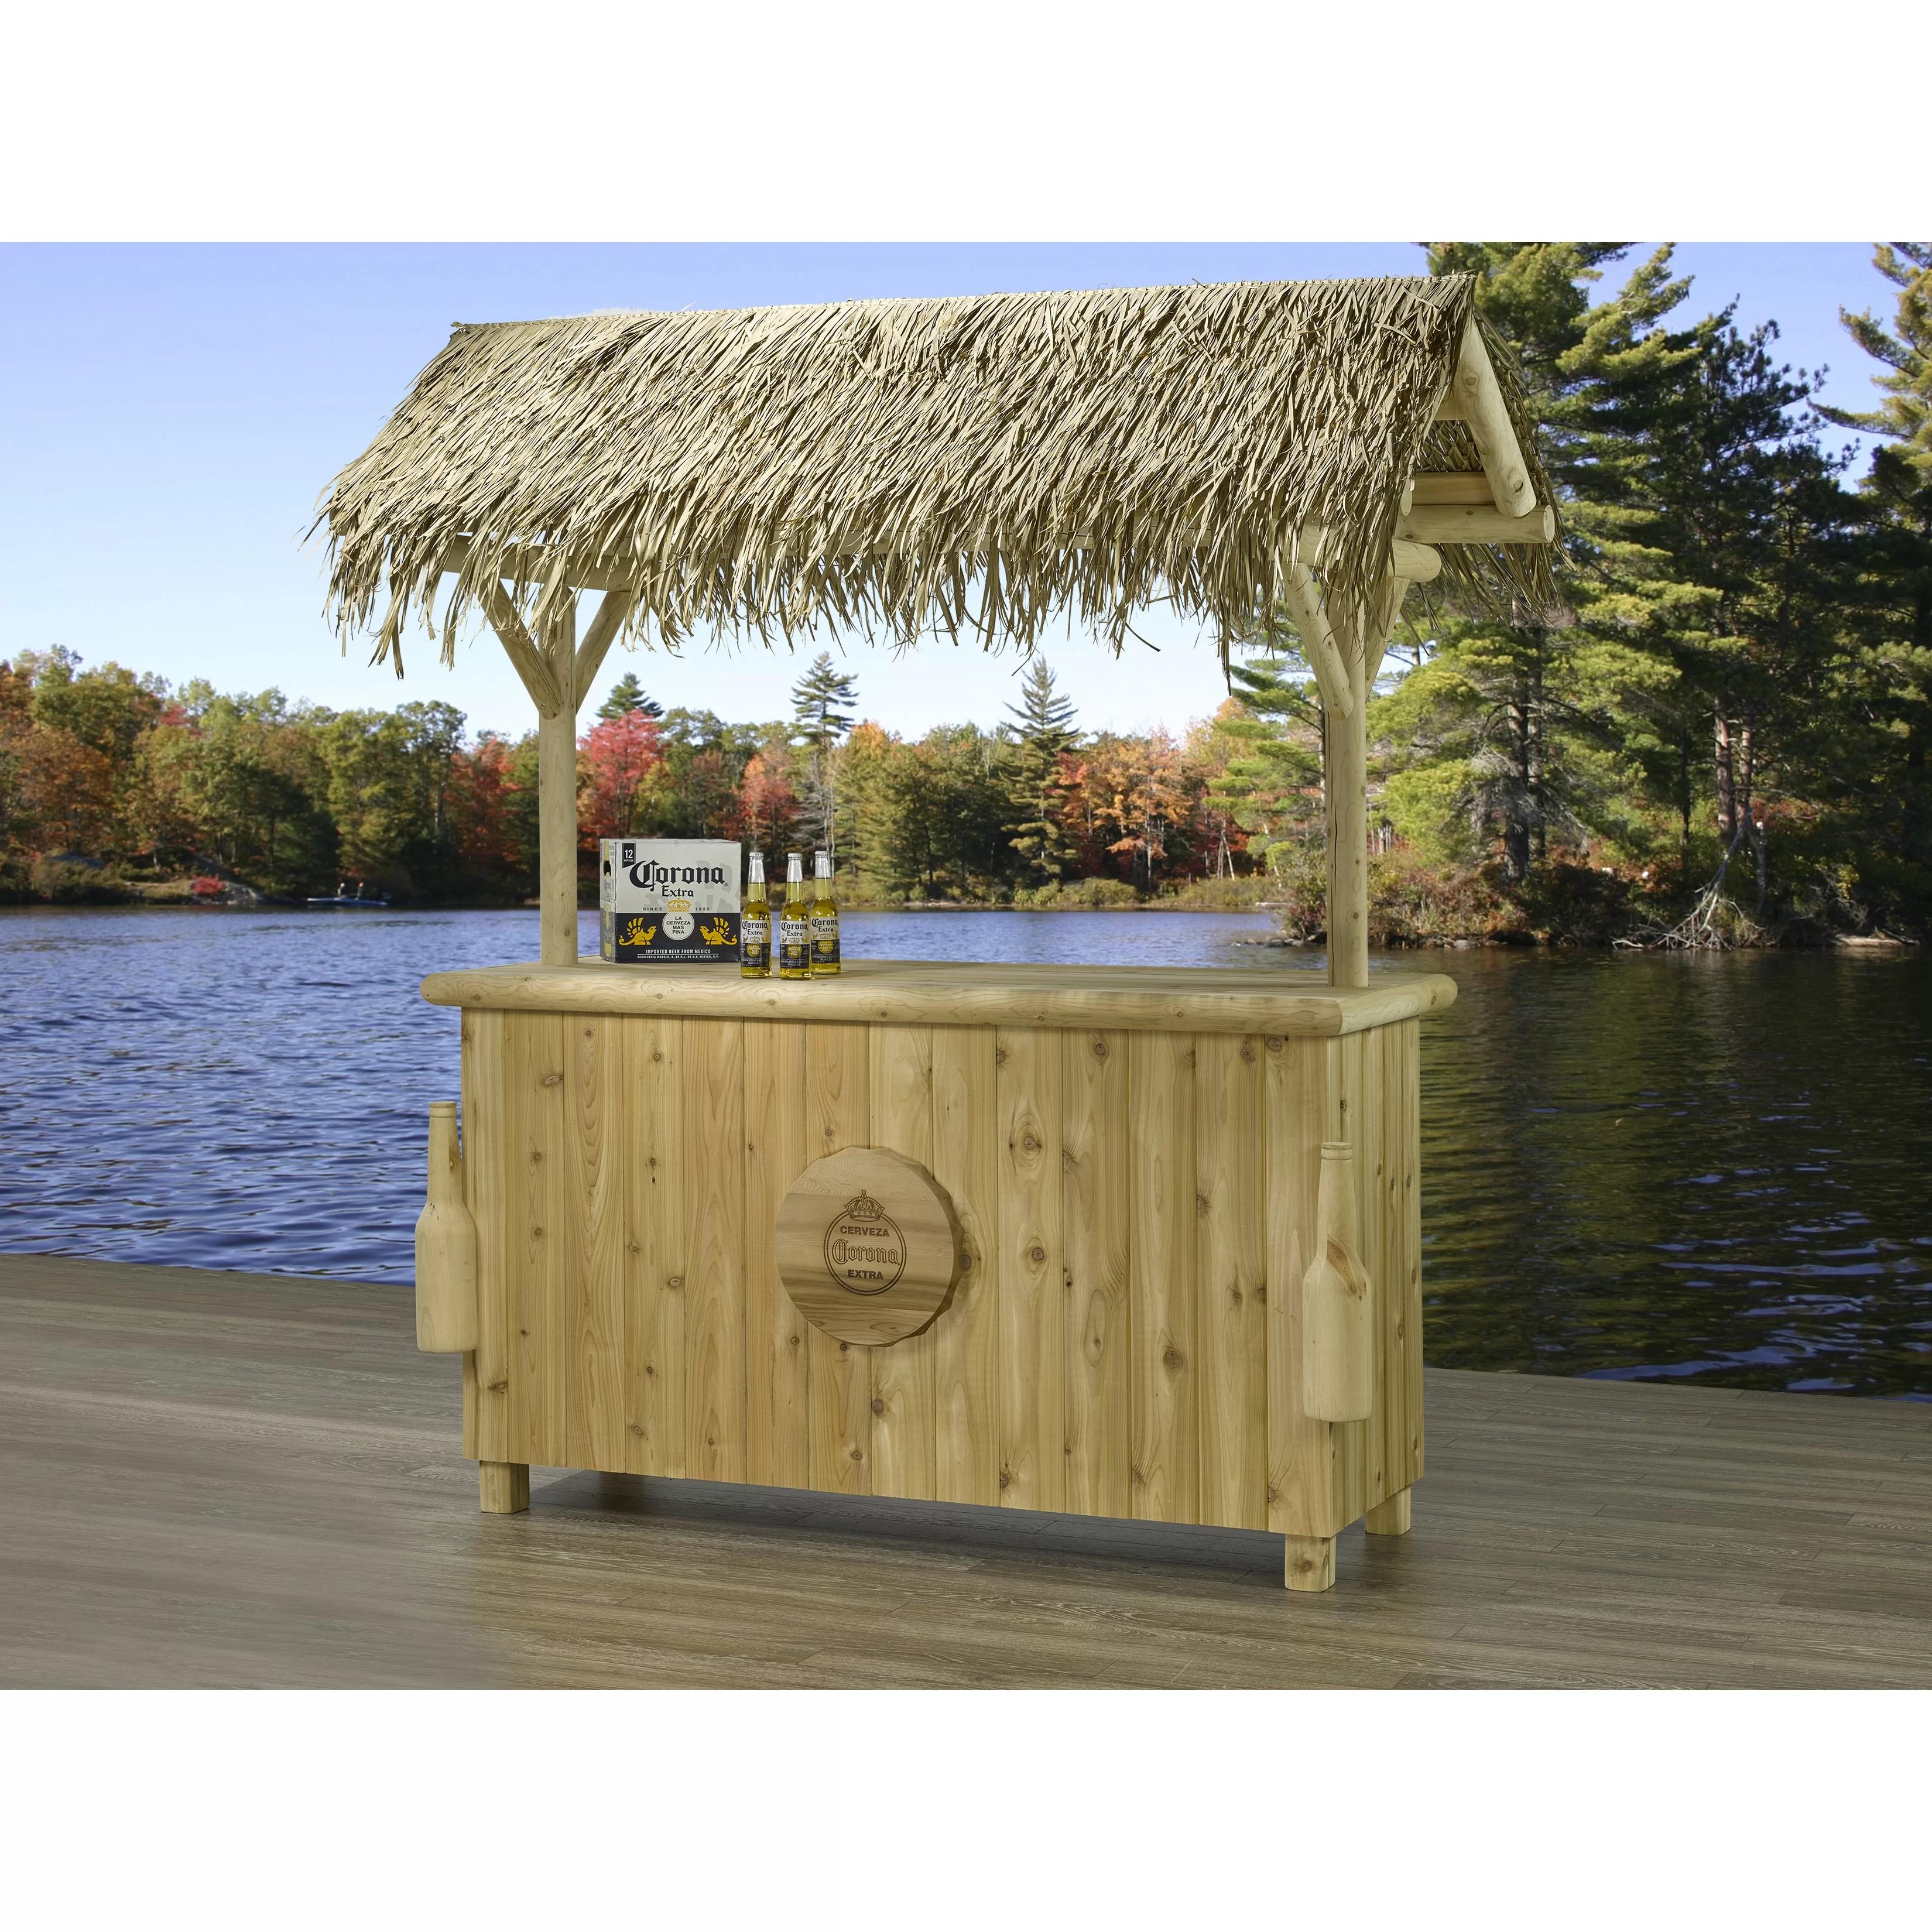 Corona 3 Piece Tiki Bar Set | Wayfair on Backyard Tiki Bar For Sale id=20259